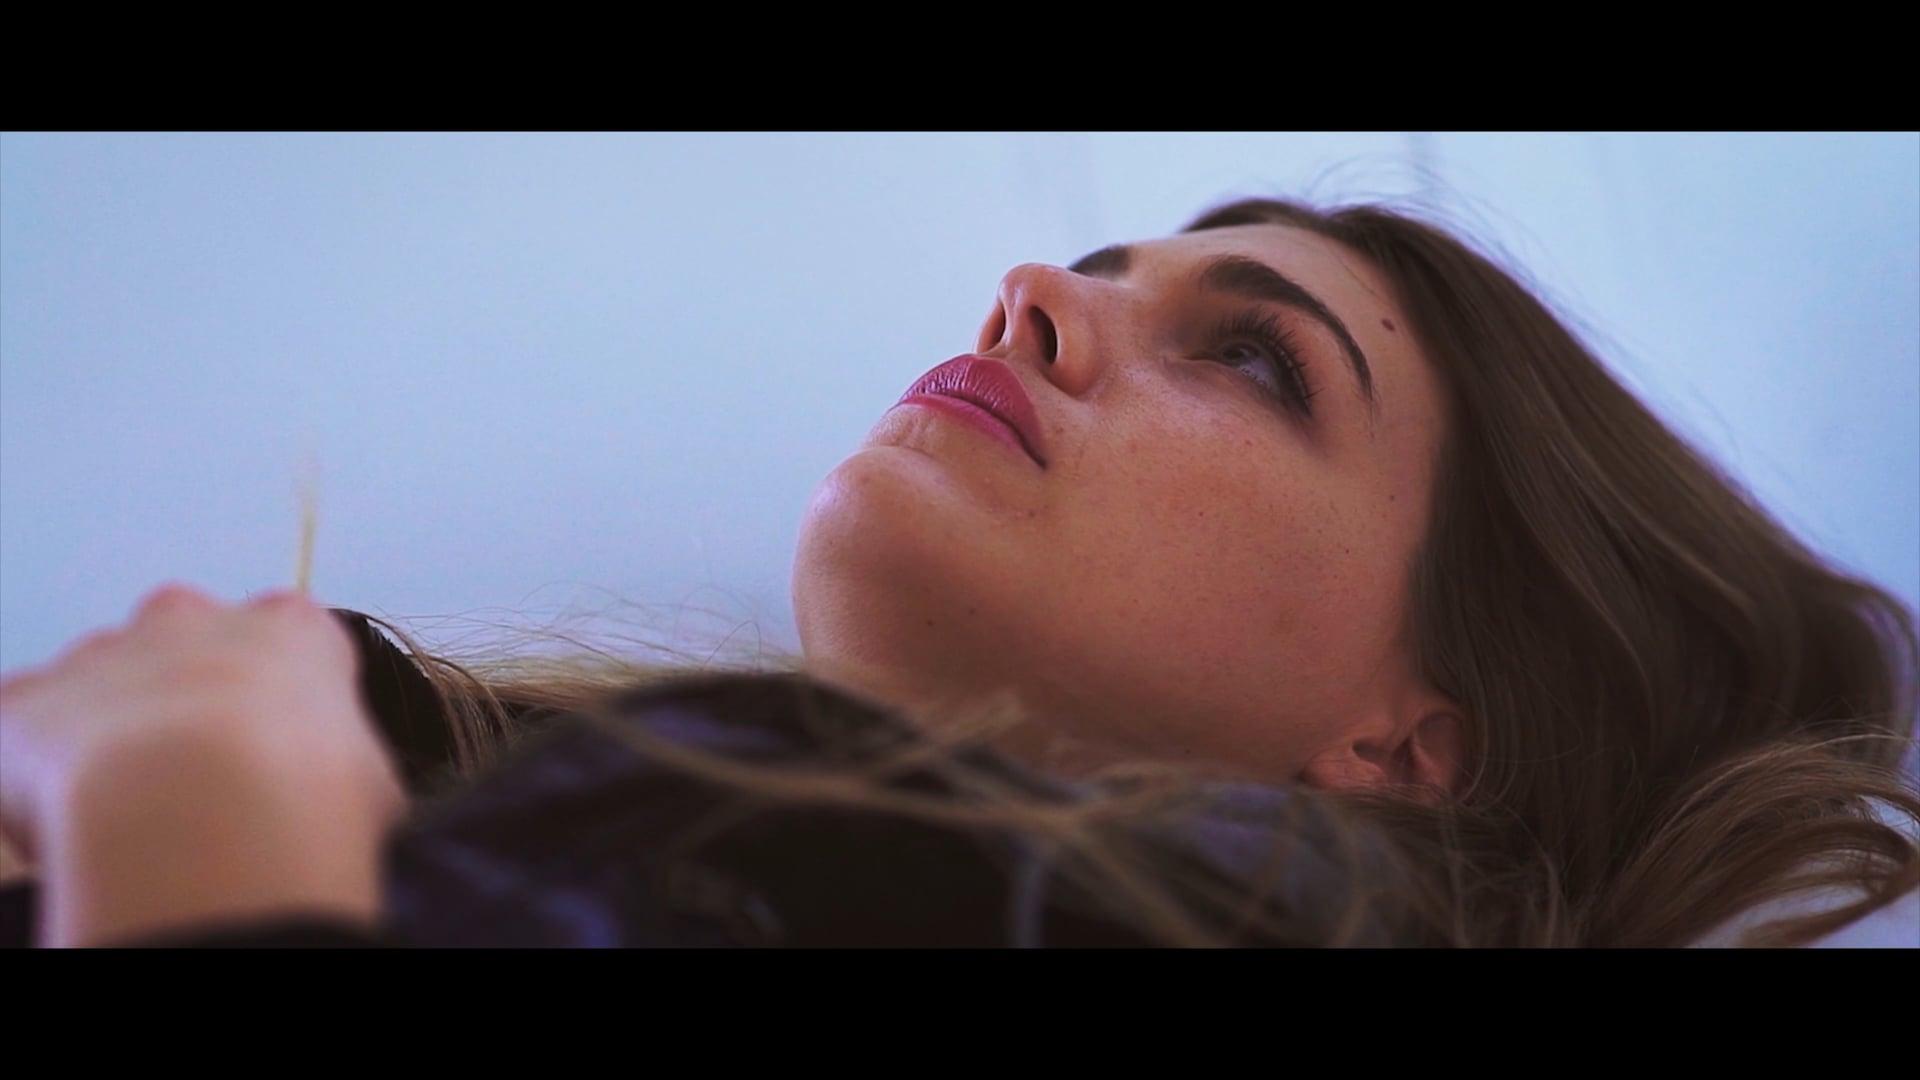 Luke Connor - Music Video Director's Reel